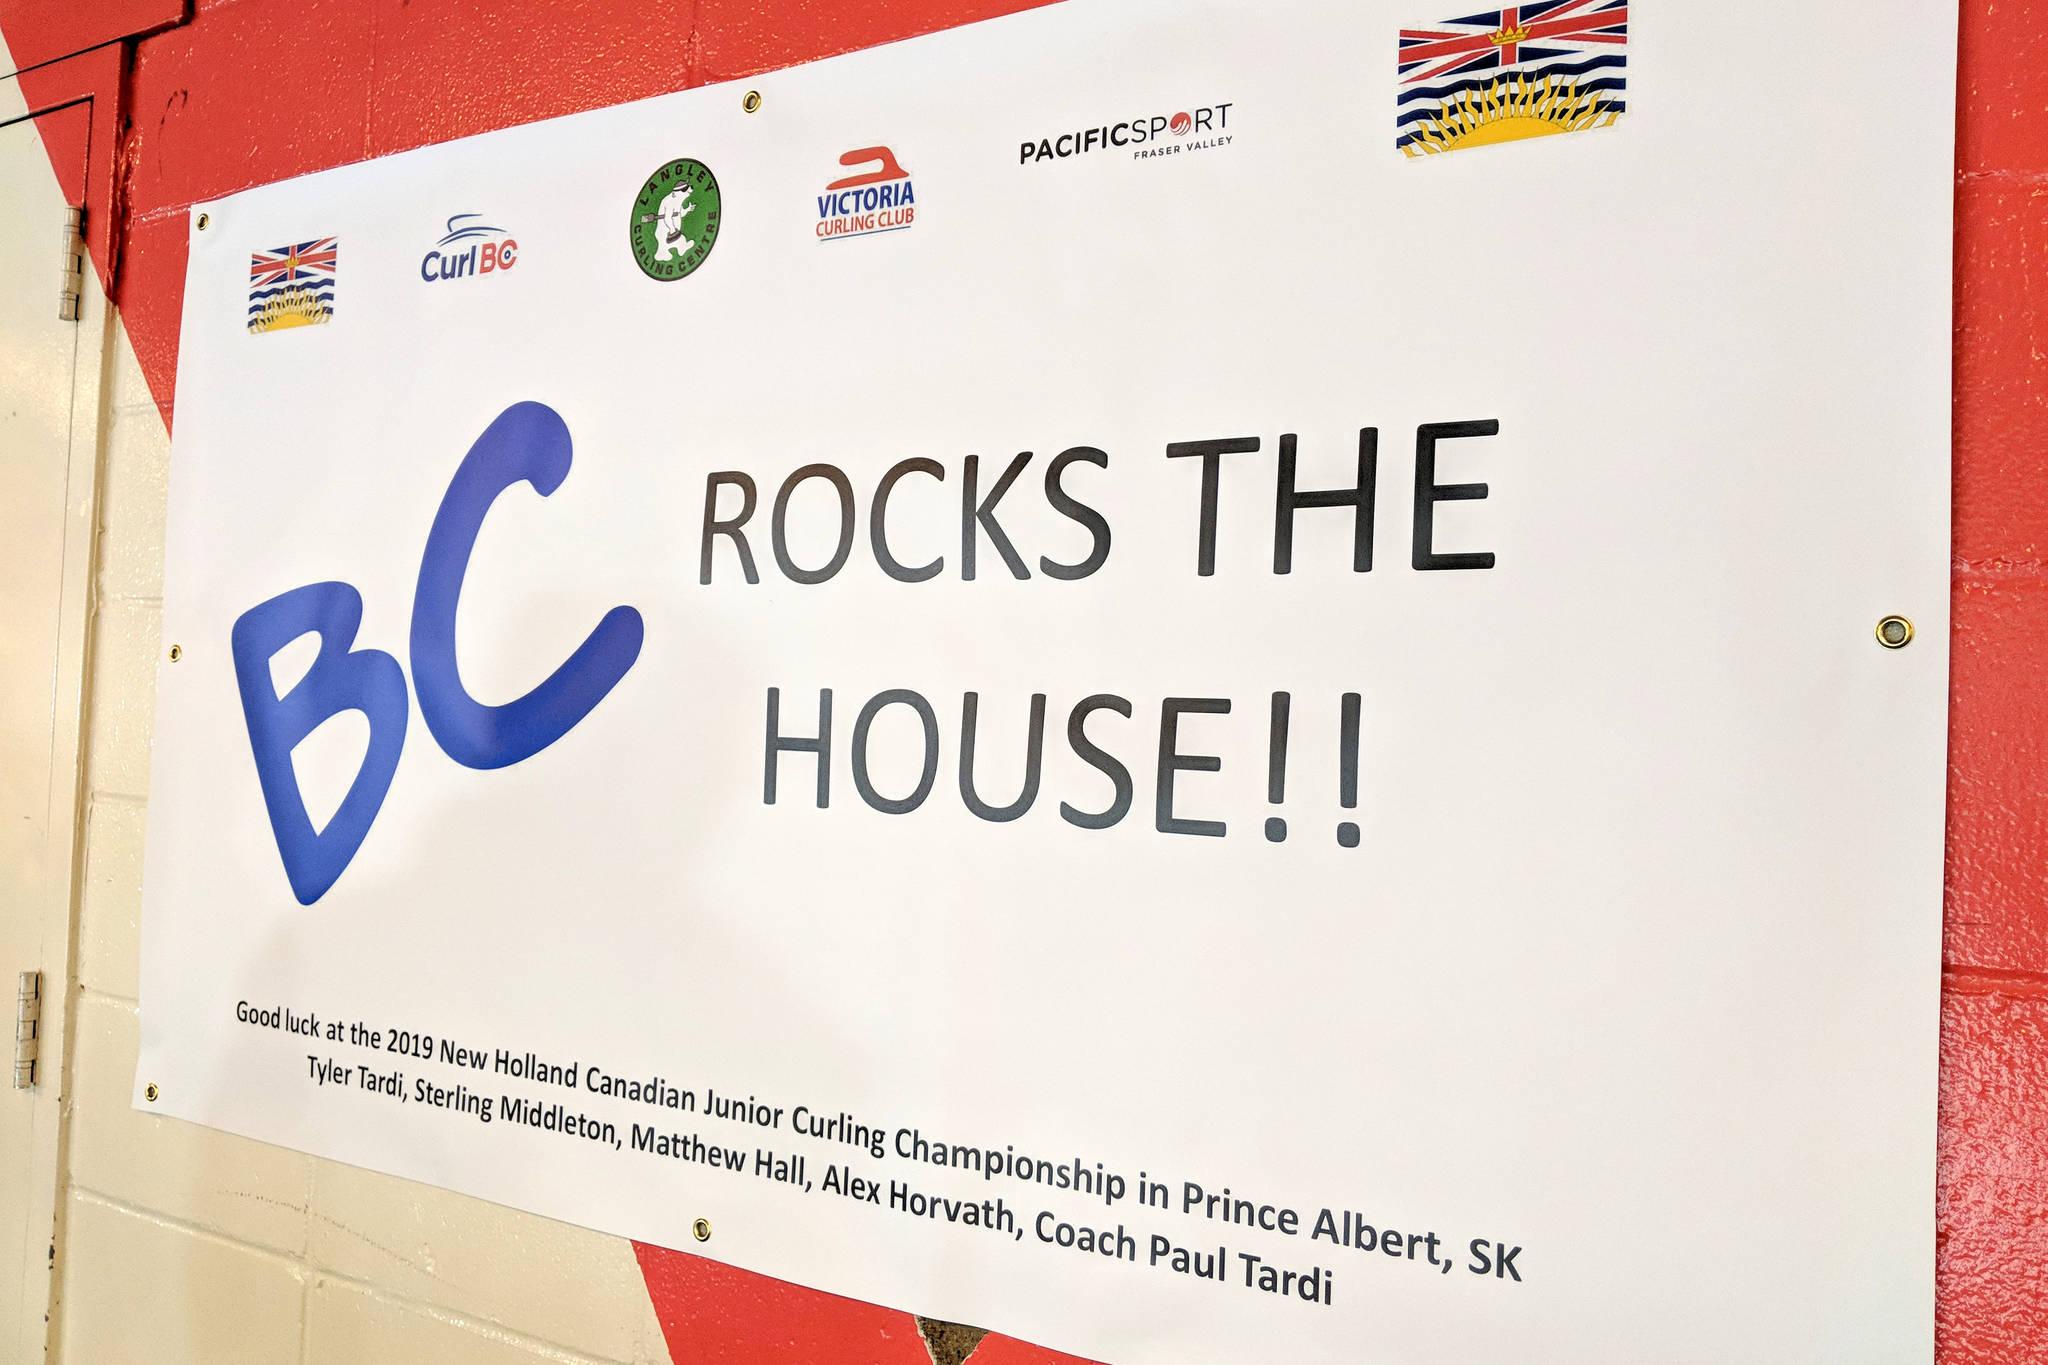 Team BC defeats its hosts at junior curling nationals Sunday